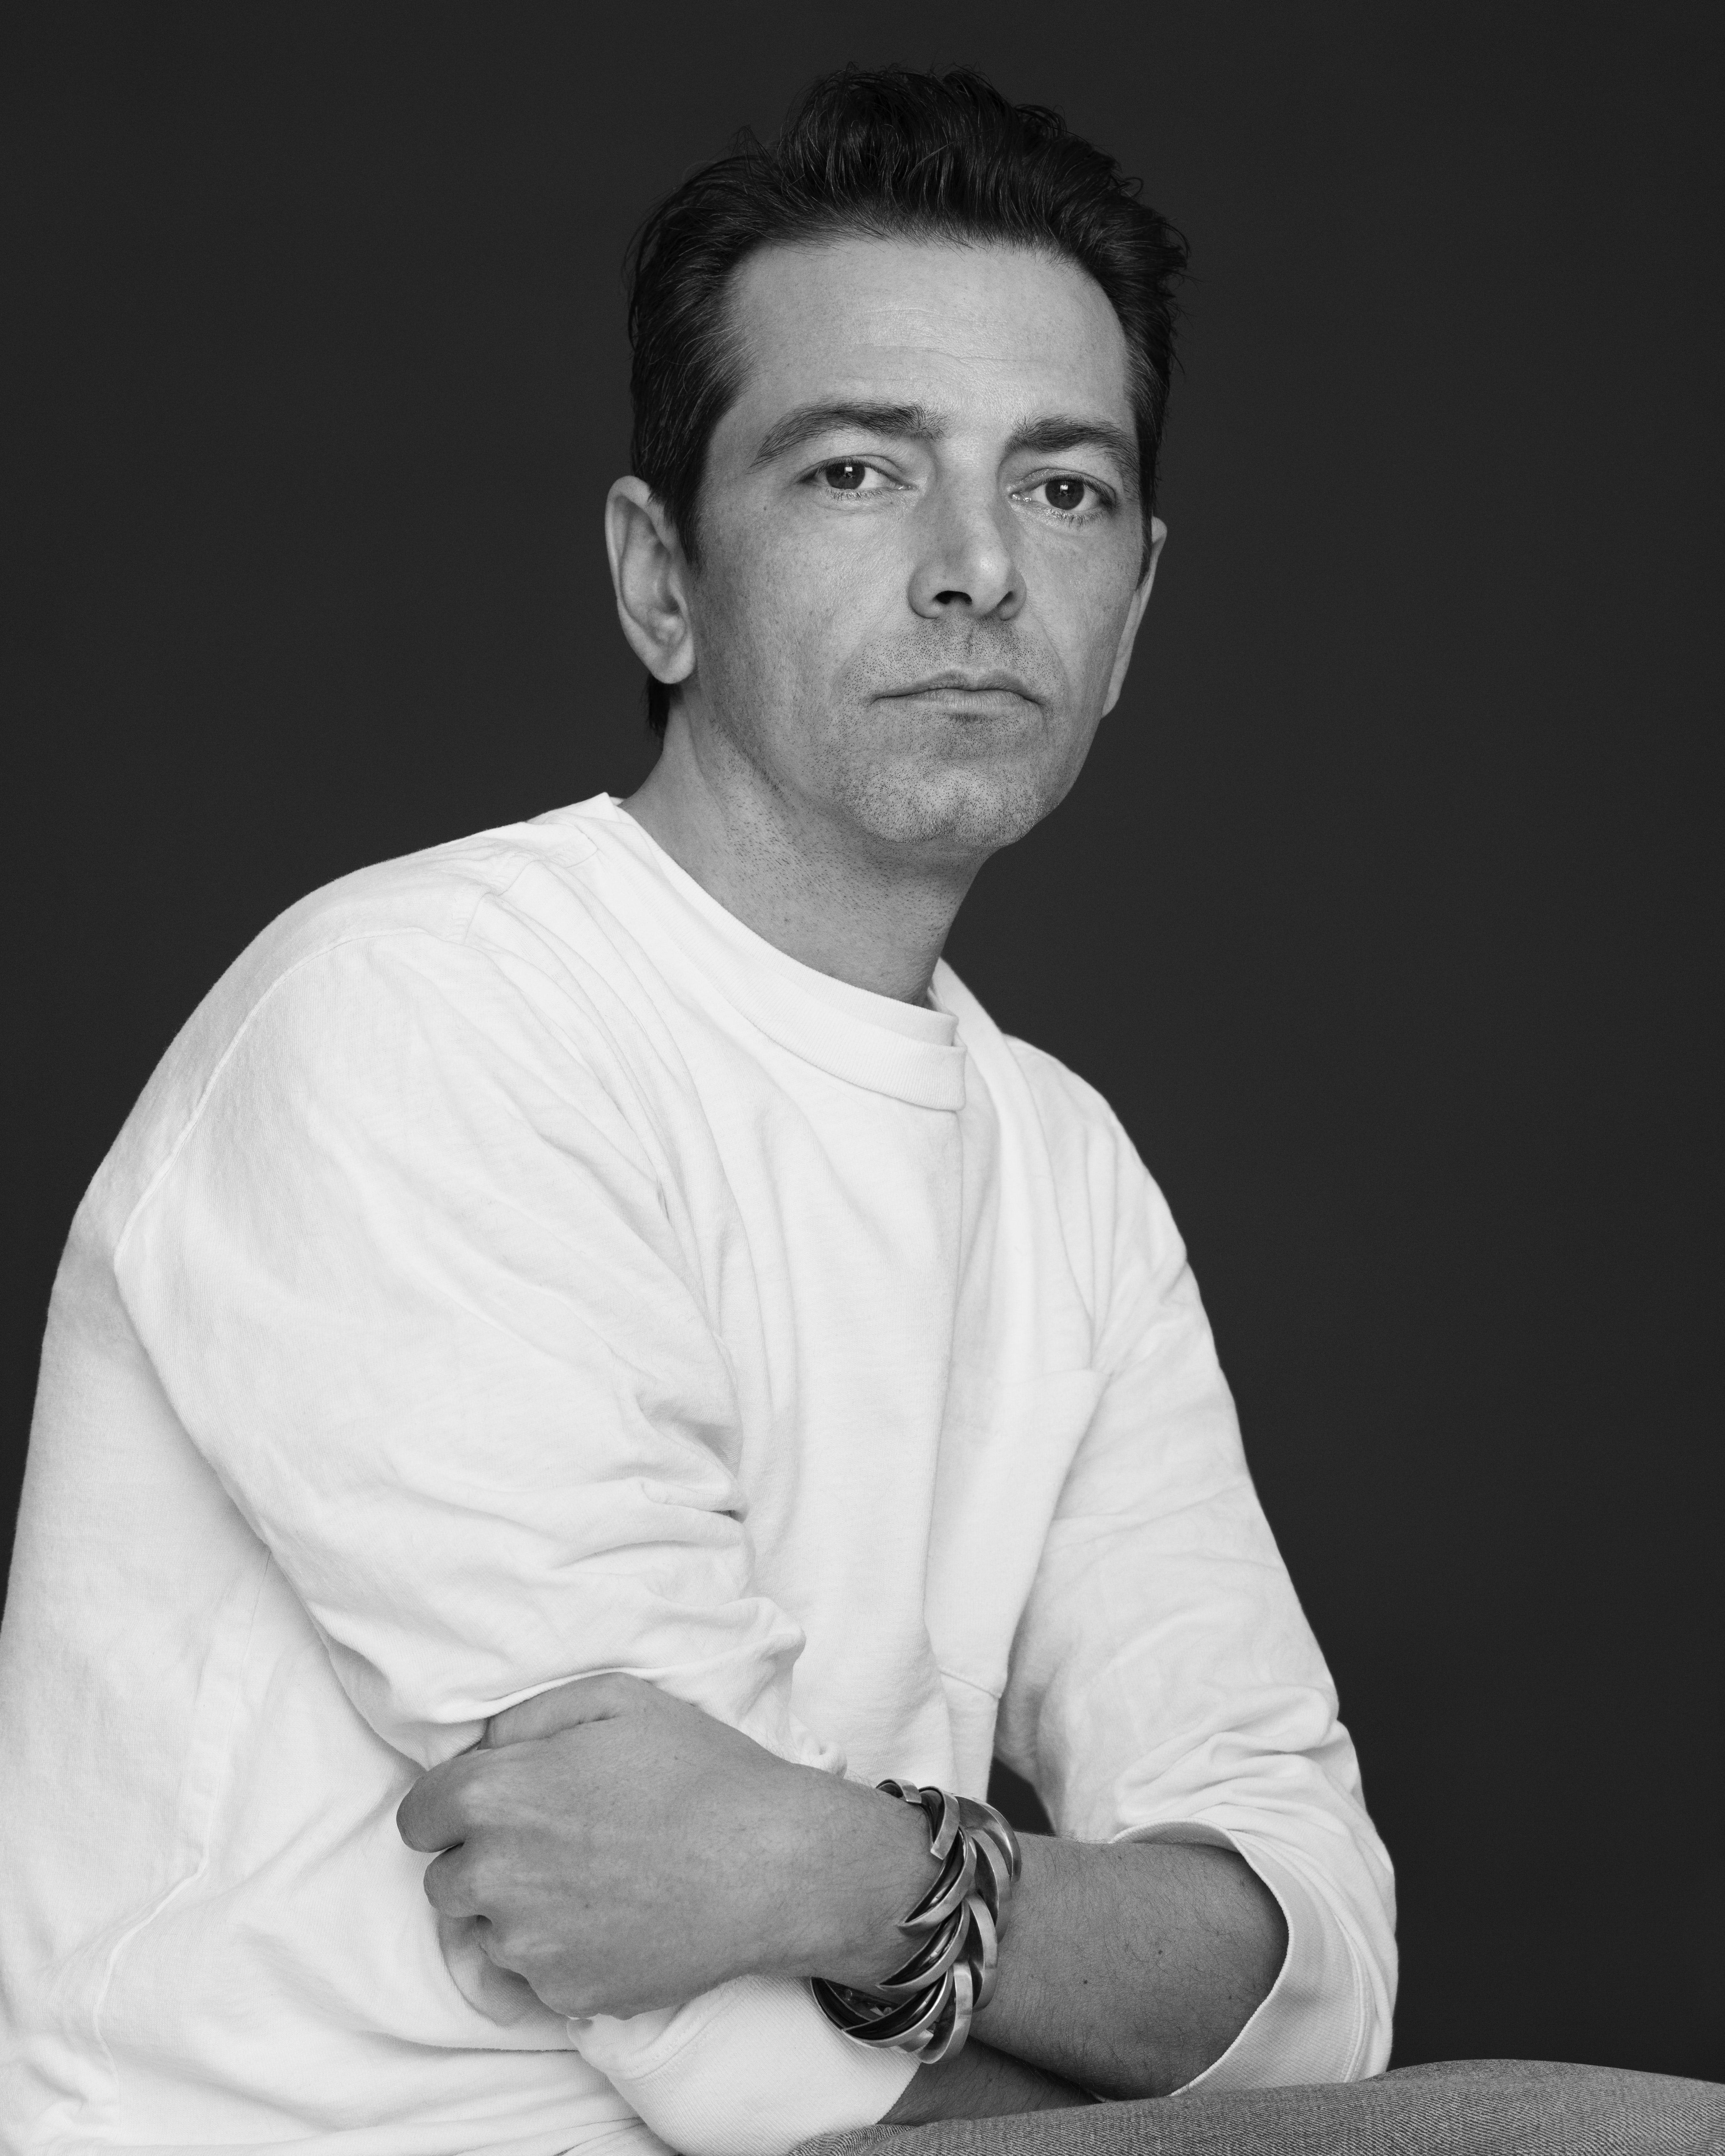 Pieter Mulier shot by Pierre Debusschere. Alaïa.